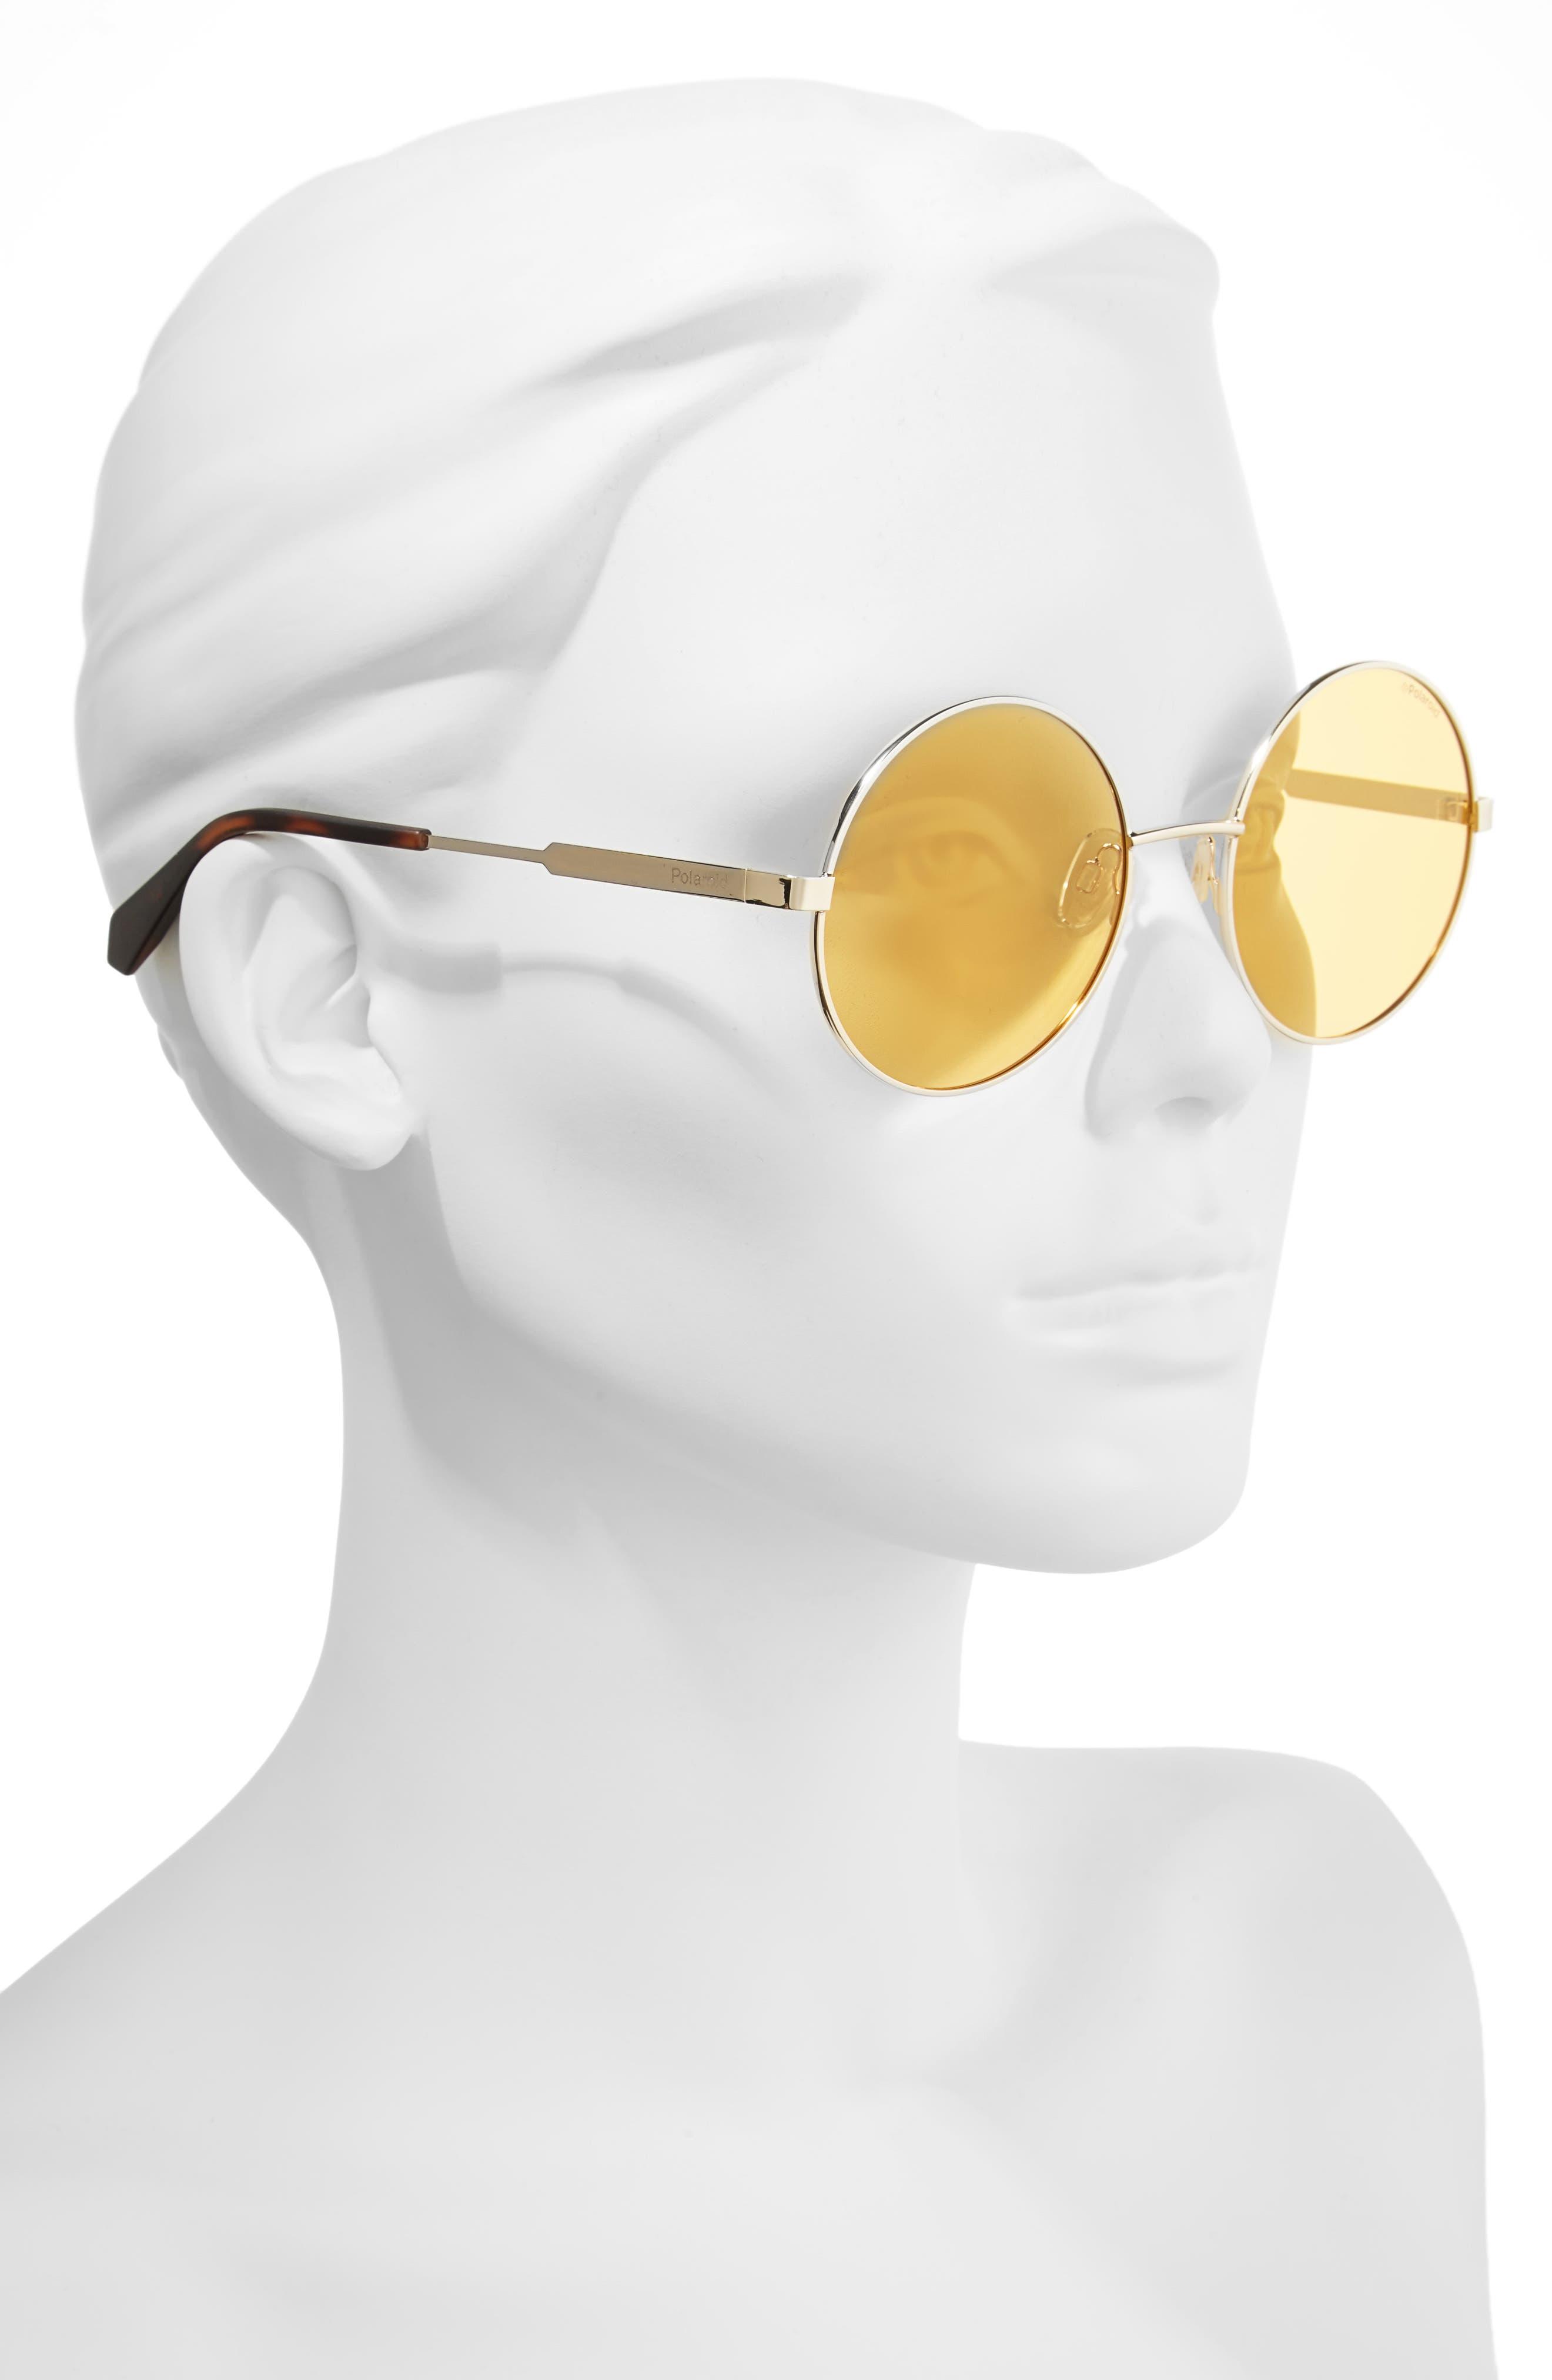 55mm Polarized Round Sunglasses,                             Alternate thumbnail 8, color,